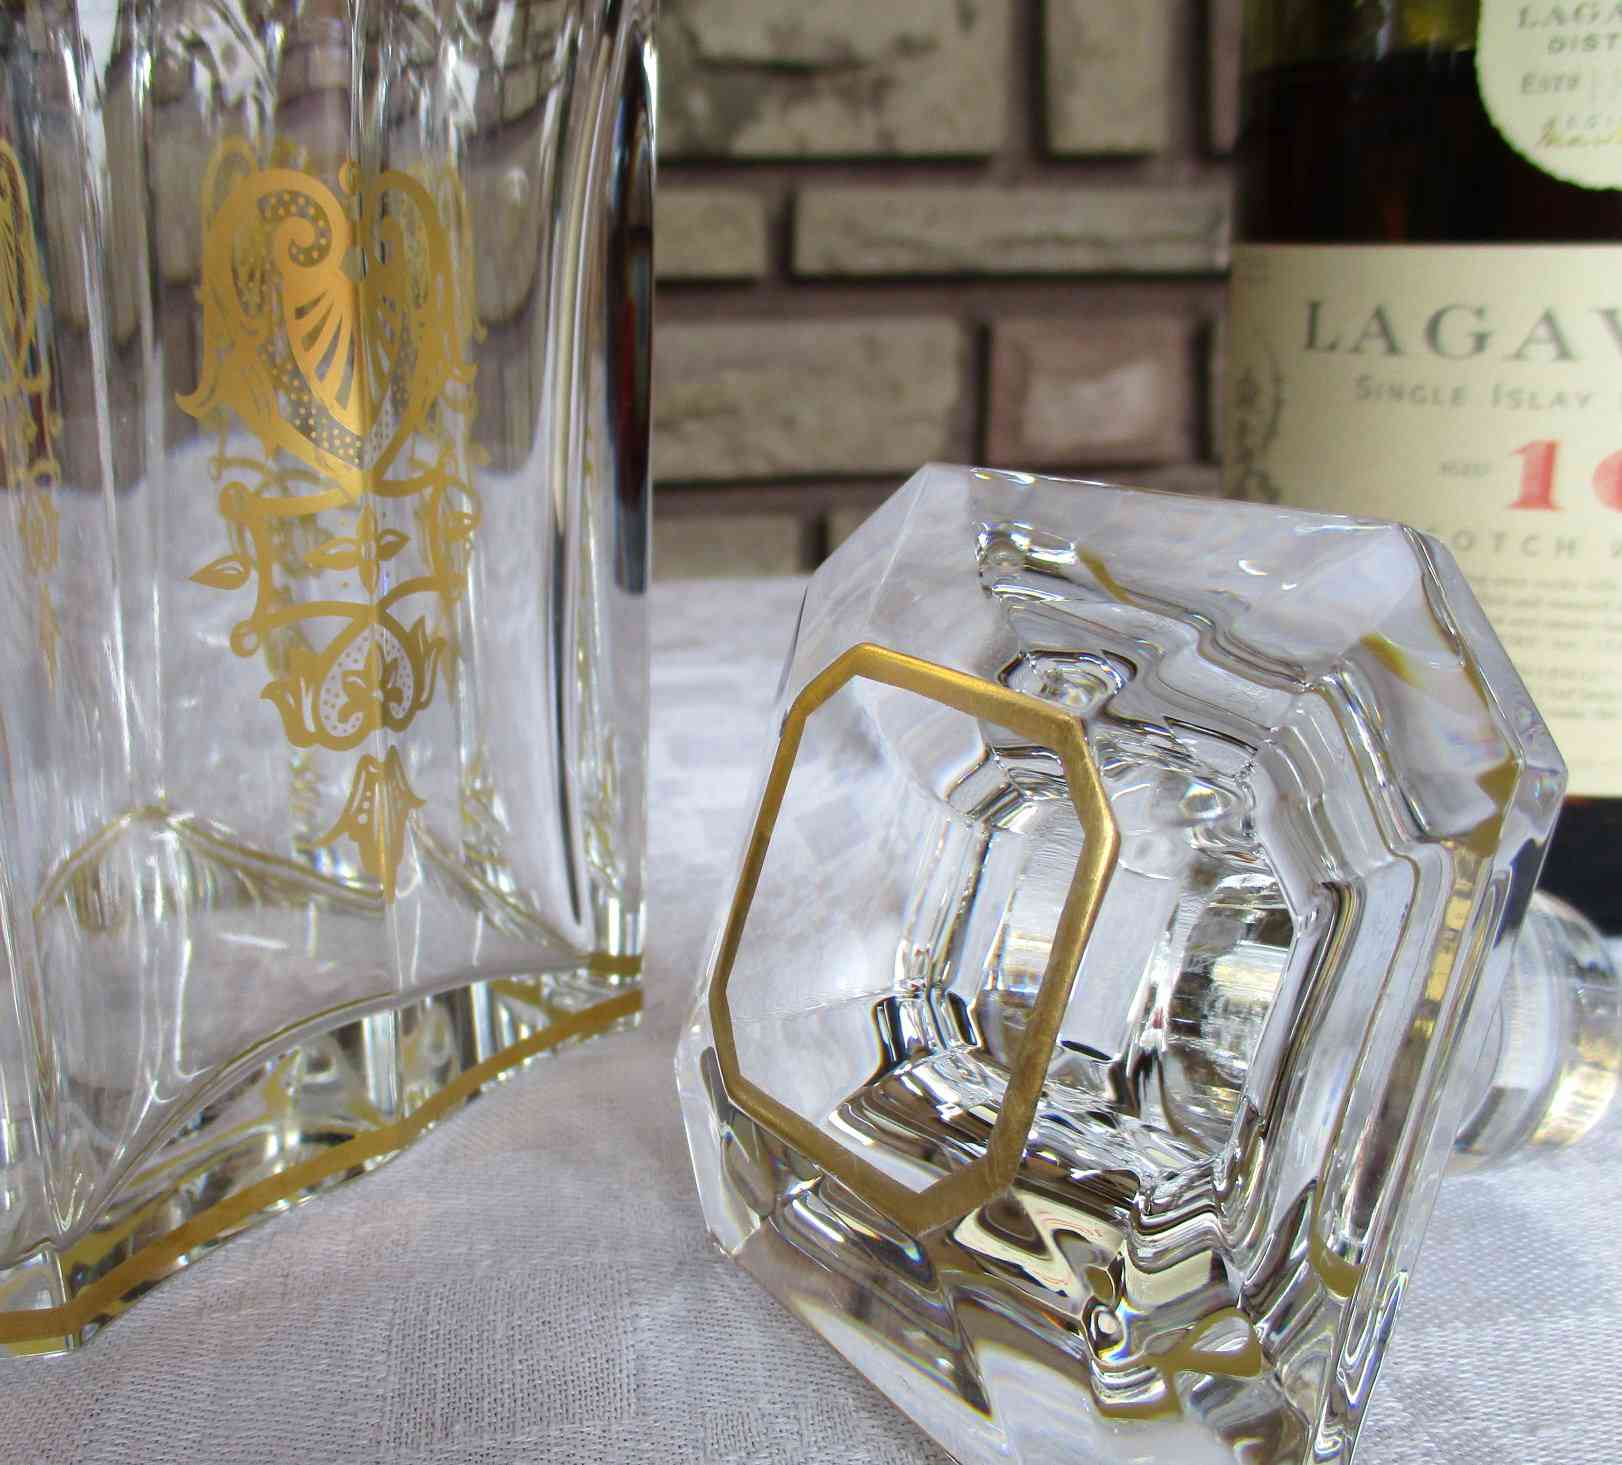 Verres baccarat cristal service harcourt empire - Service harcourt baccarat ...